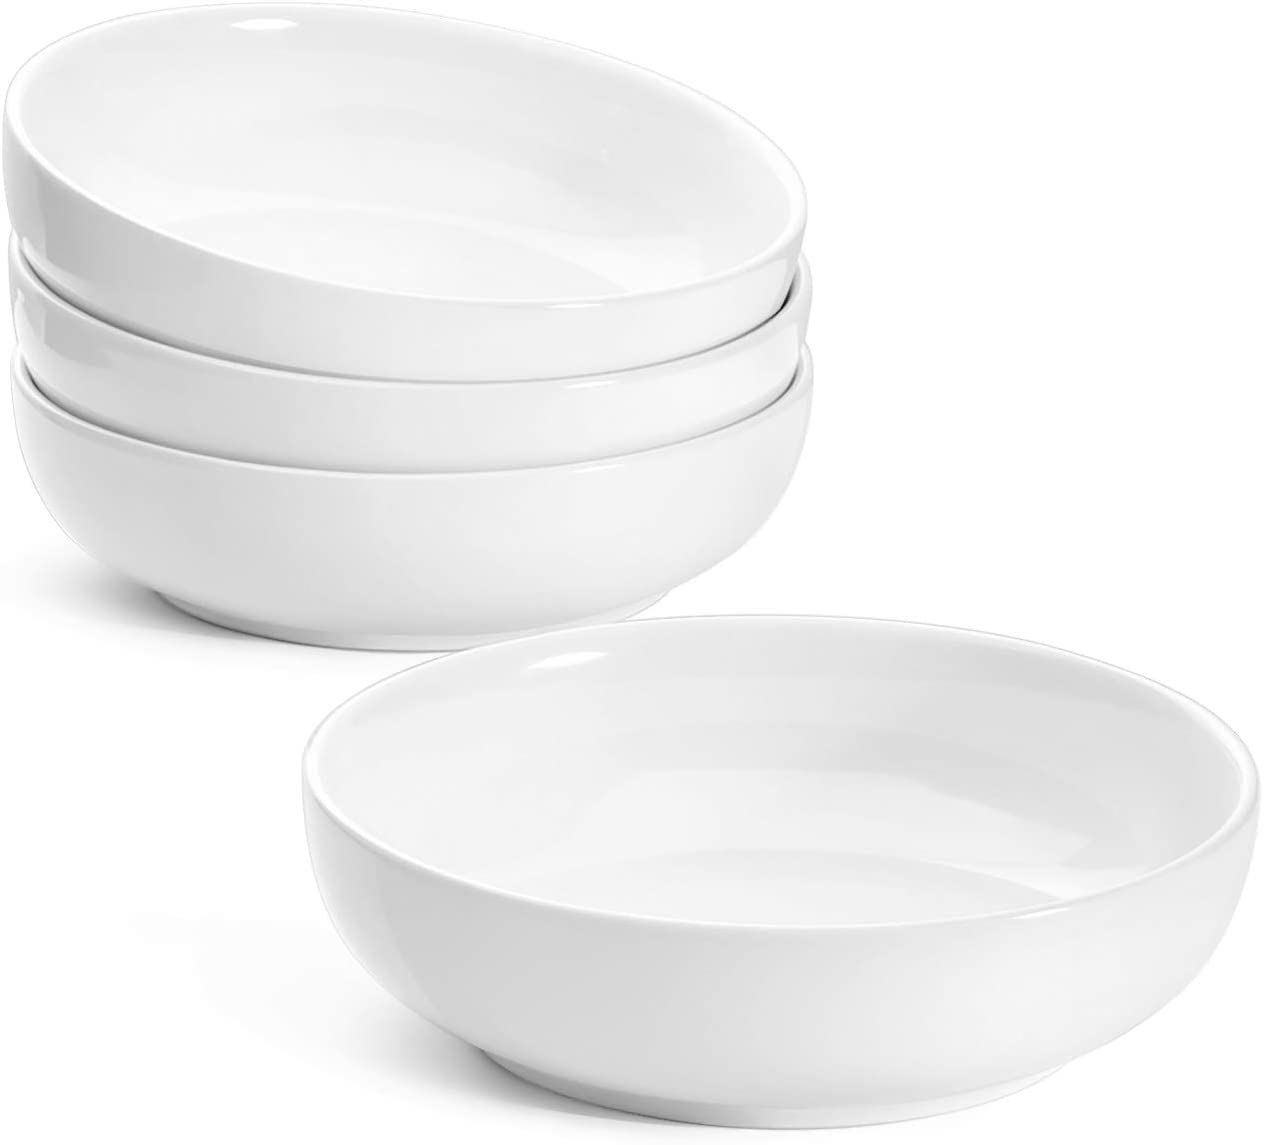 Large Salad Bowls